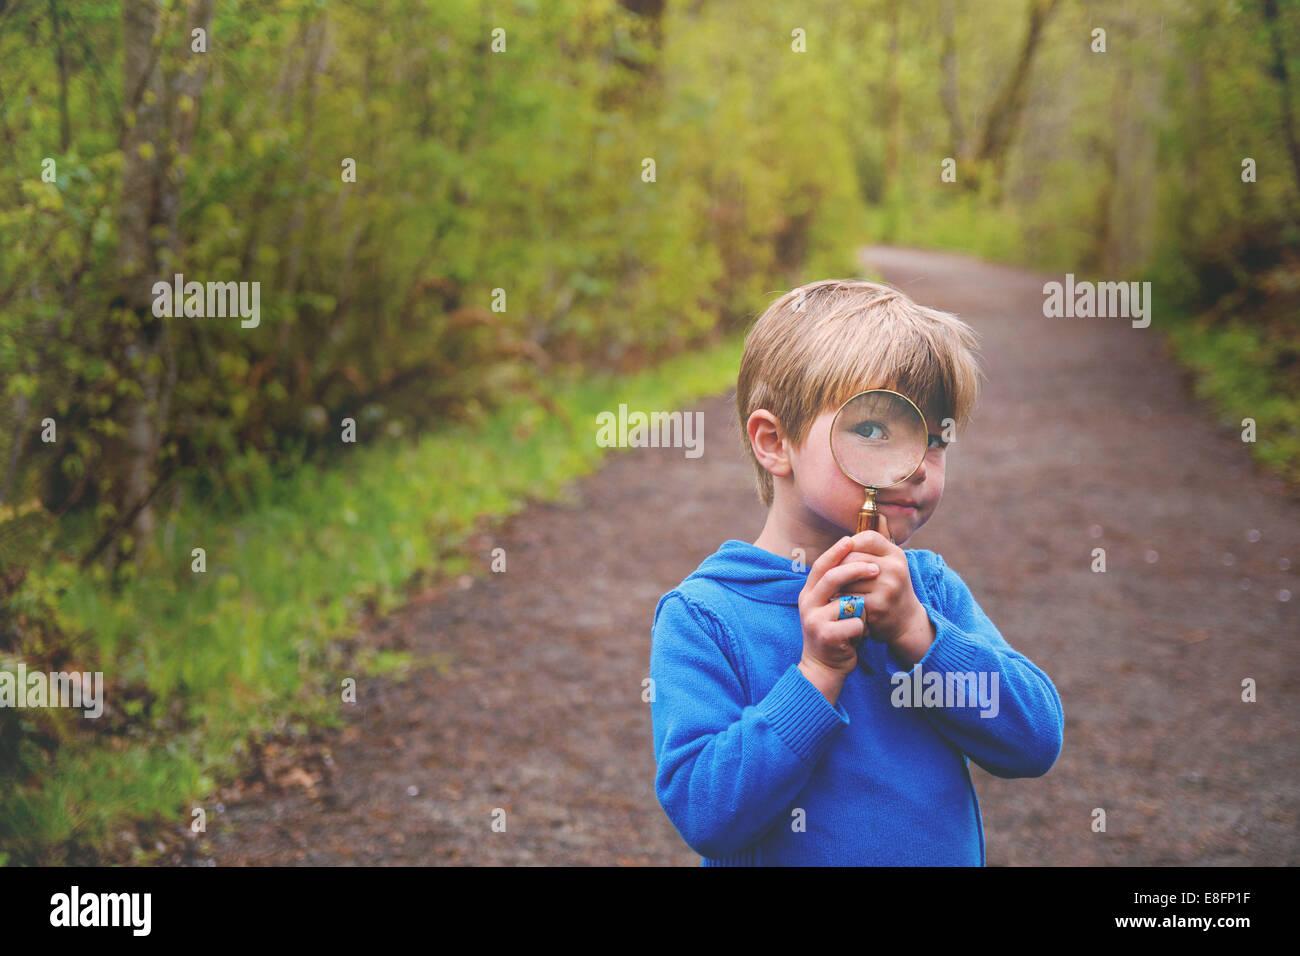 Boy (4-5) mirando a través de una lupa en Nature Trail Imagen De Stock